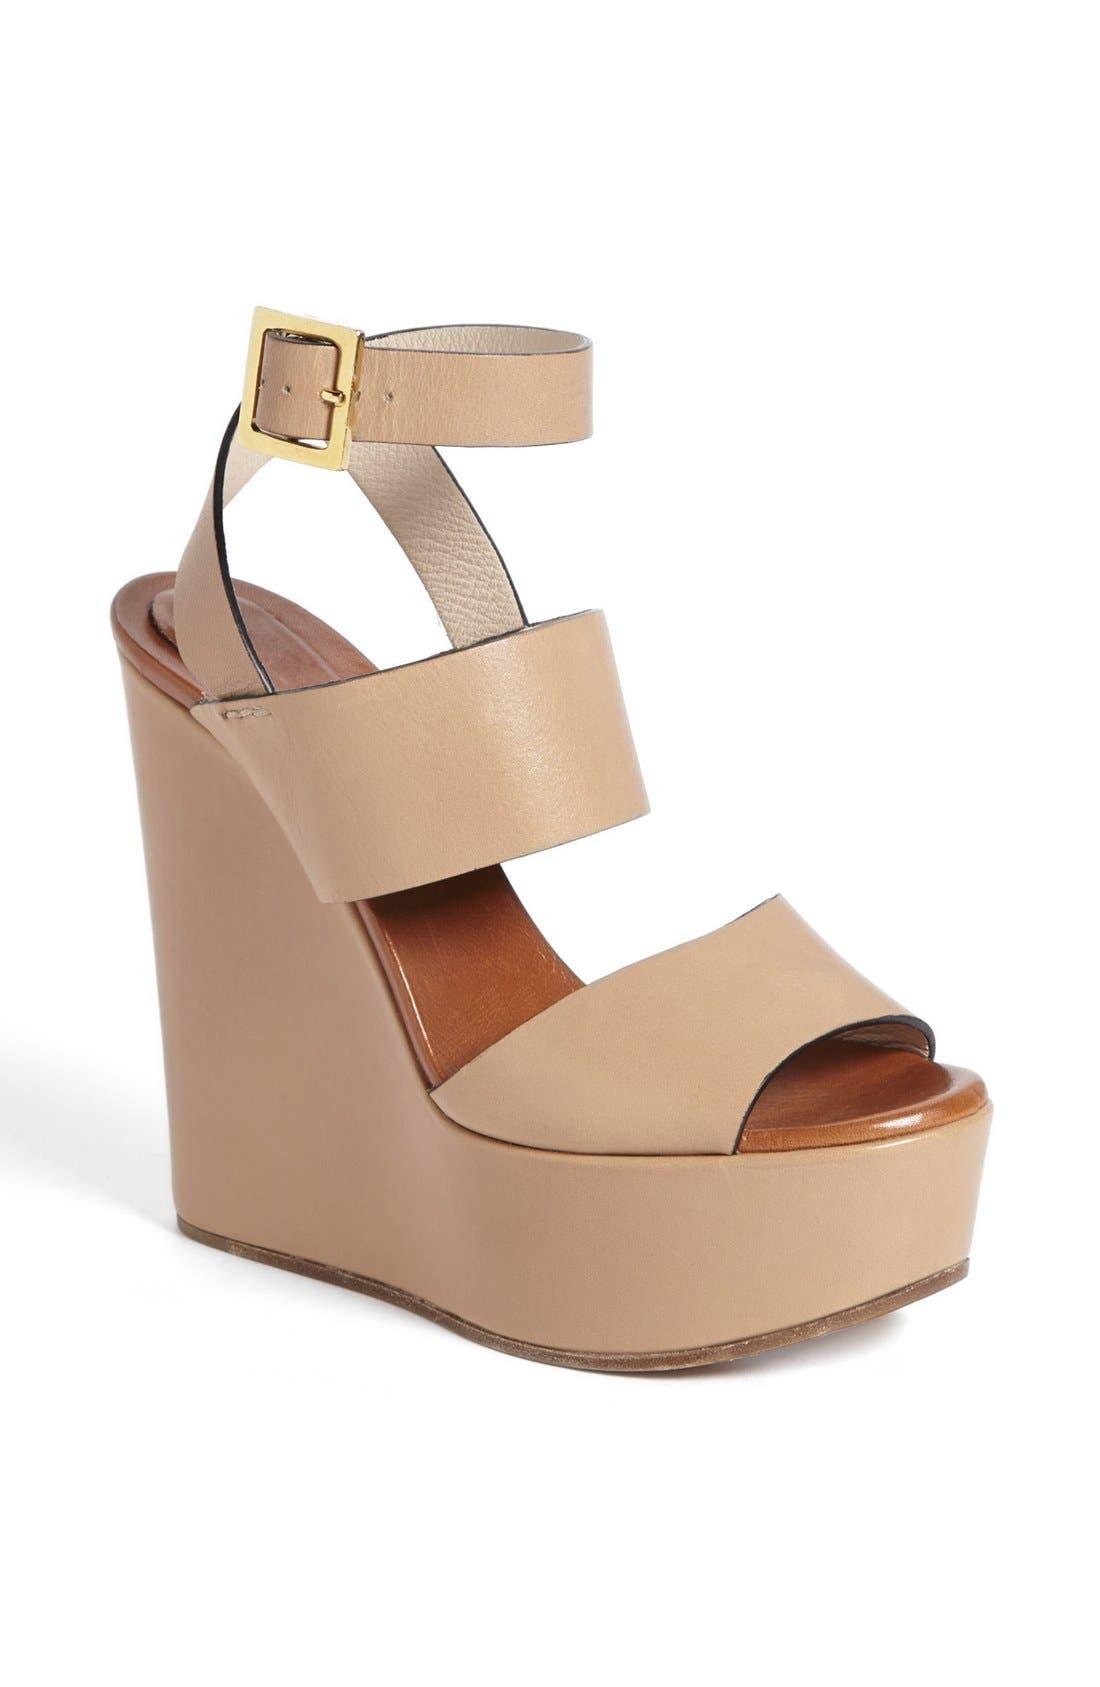 Alternate Image 1 Selected - Chloé 'Central' Wedge Sandal